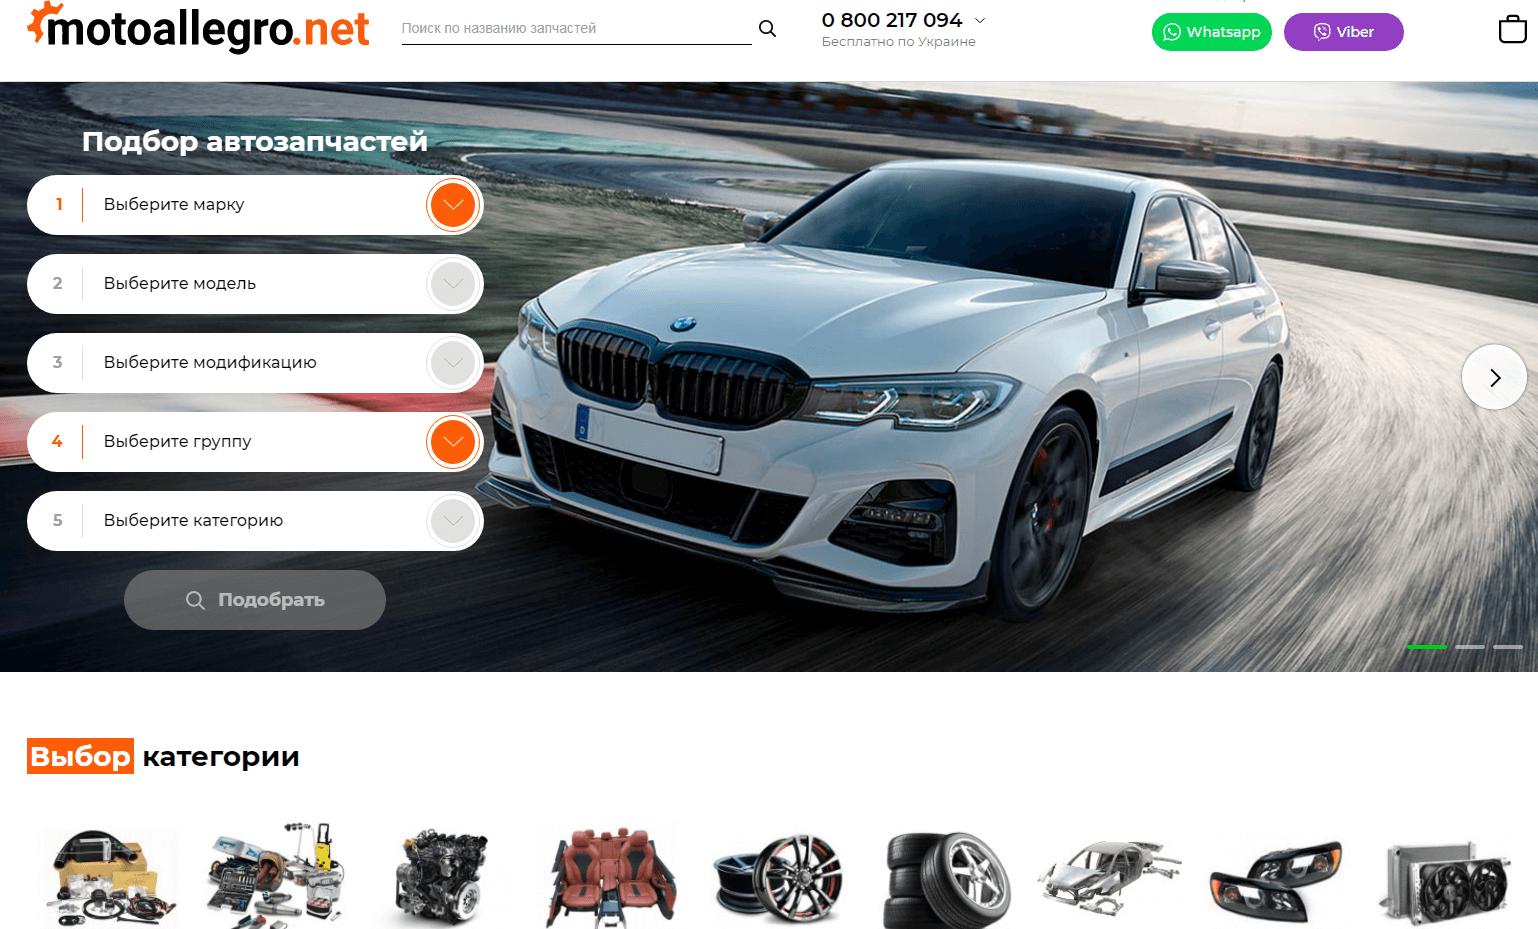 Компания Motoallegro.net